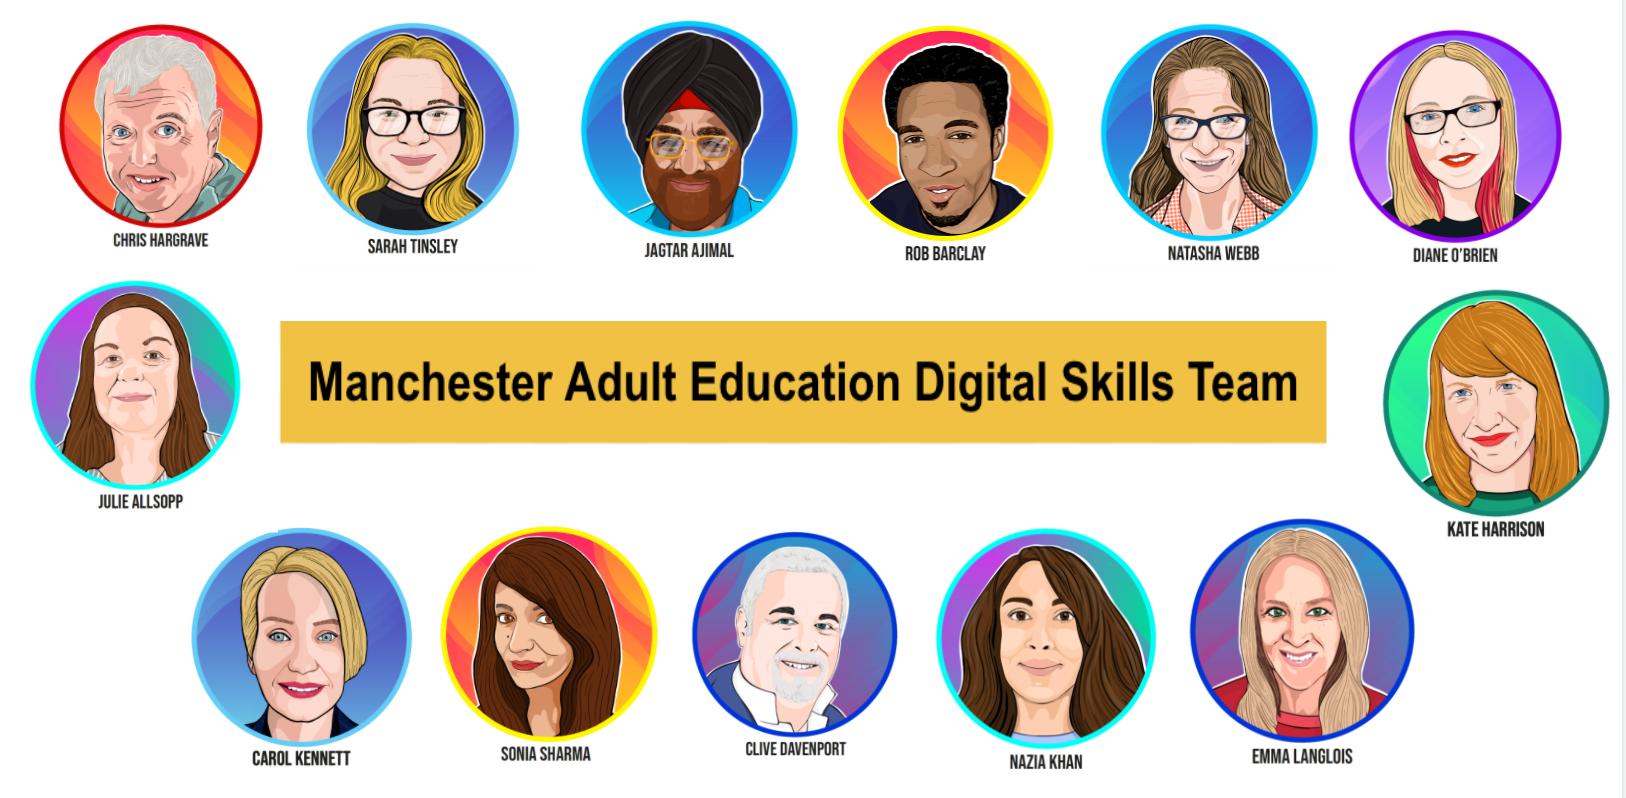 Manchester Adult Education Digital Skills team portraits